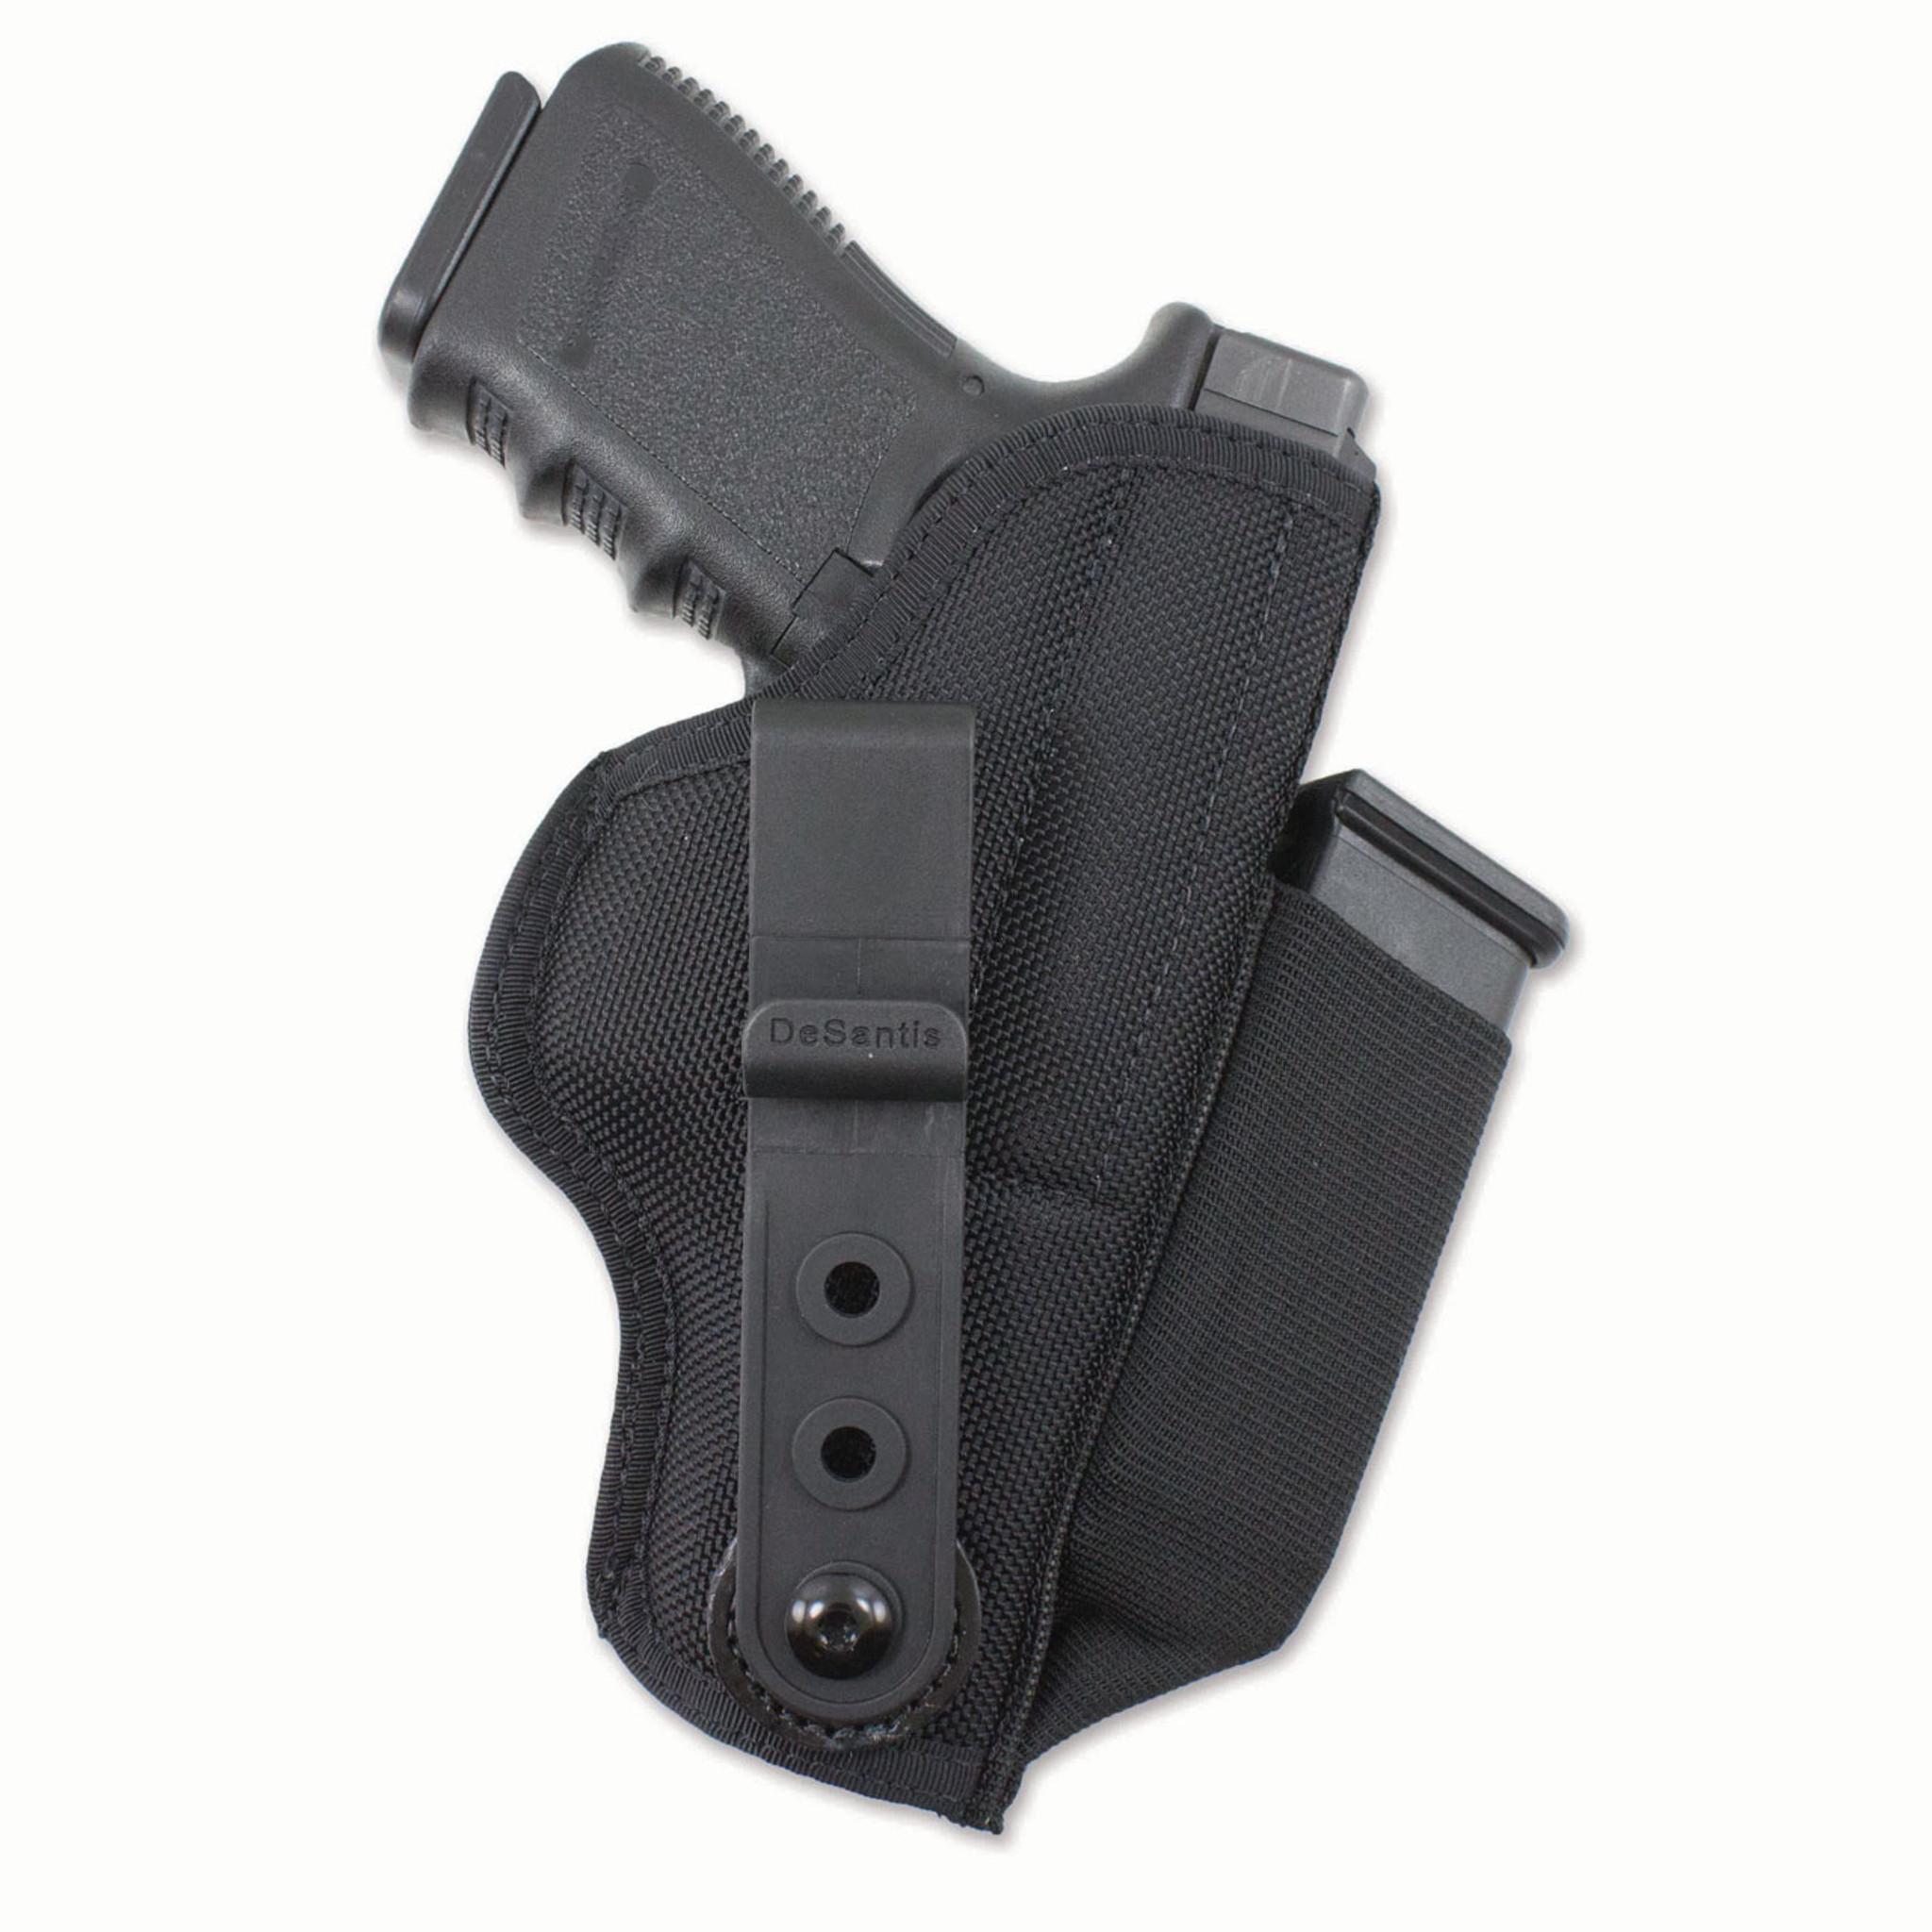 IWB Nylon Gun Holster For Walther PP,PPS